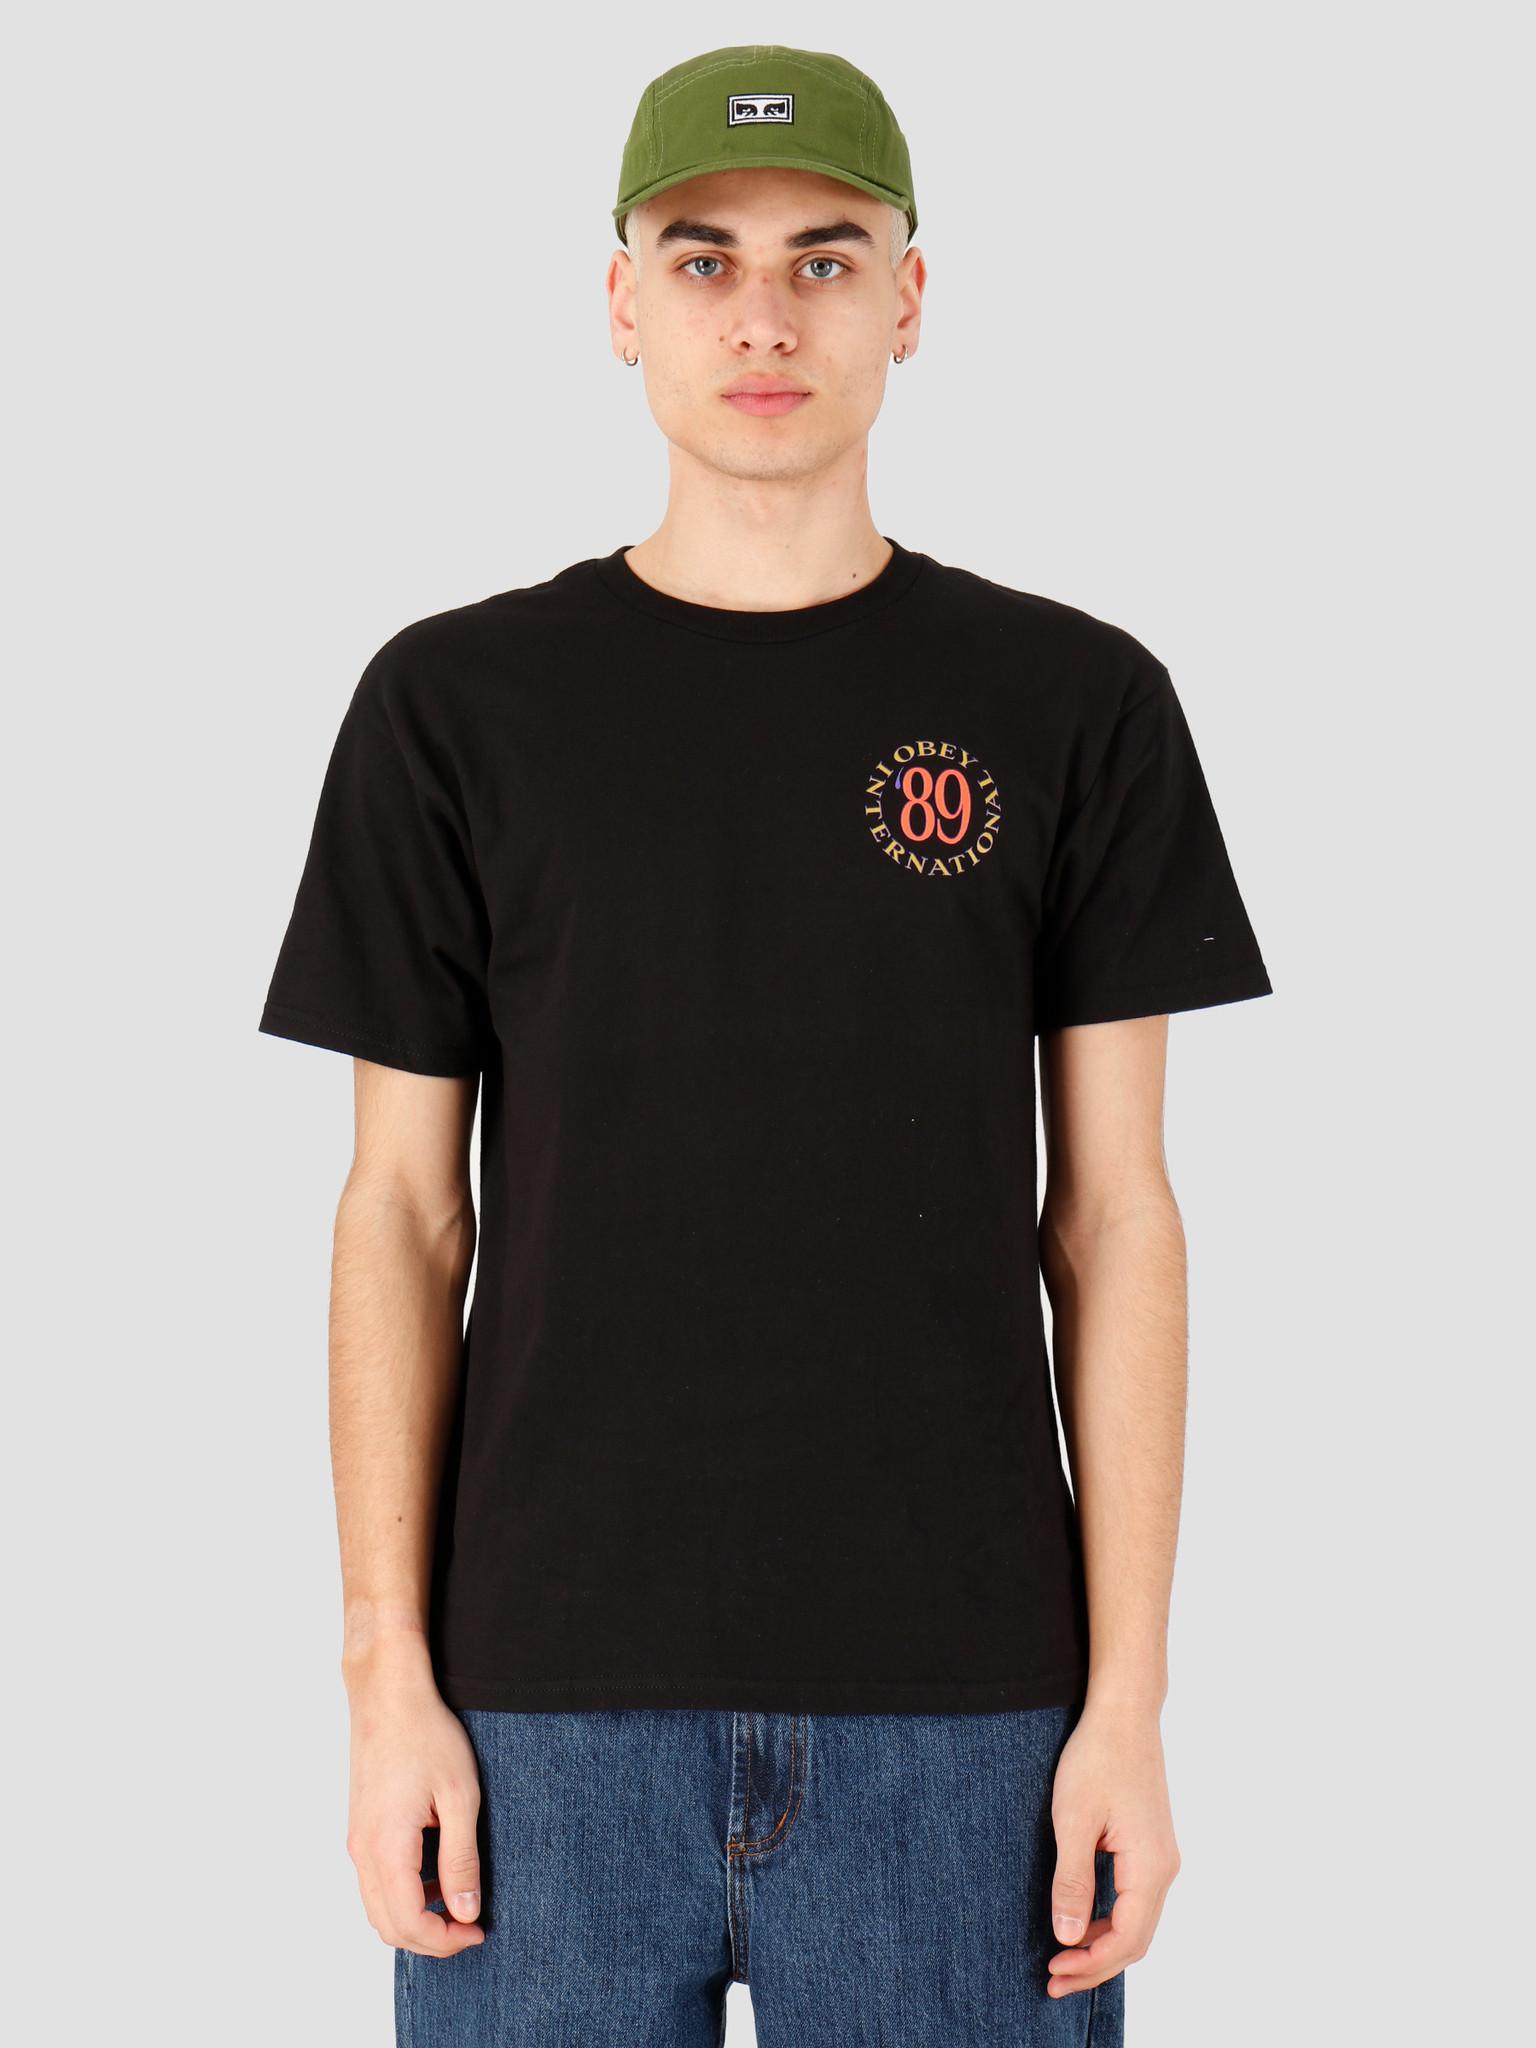 Obey Obey Obey international '89 T-shirt Black 163082230 BLK